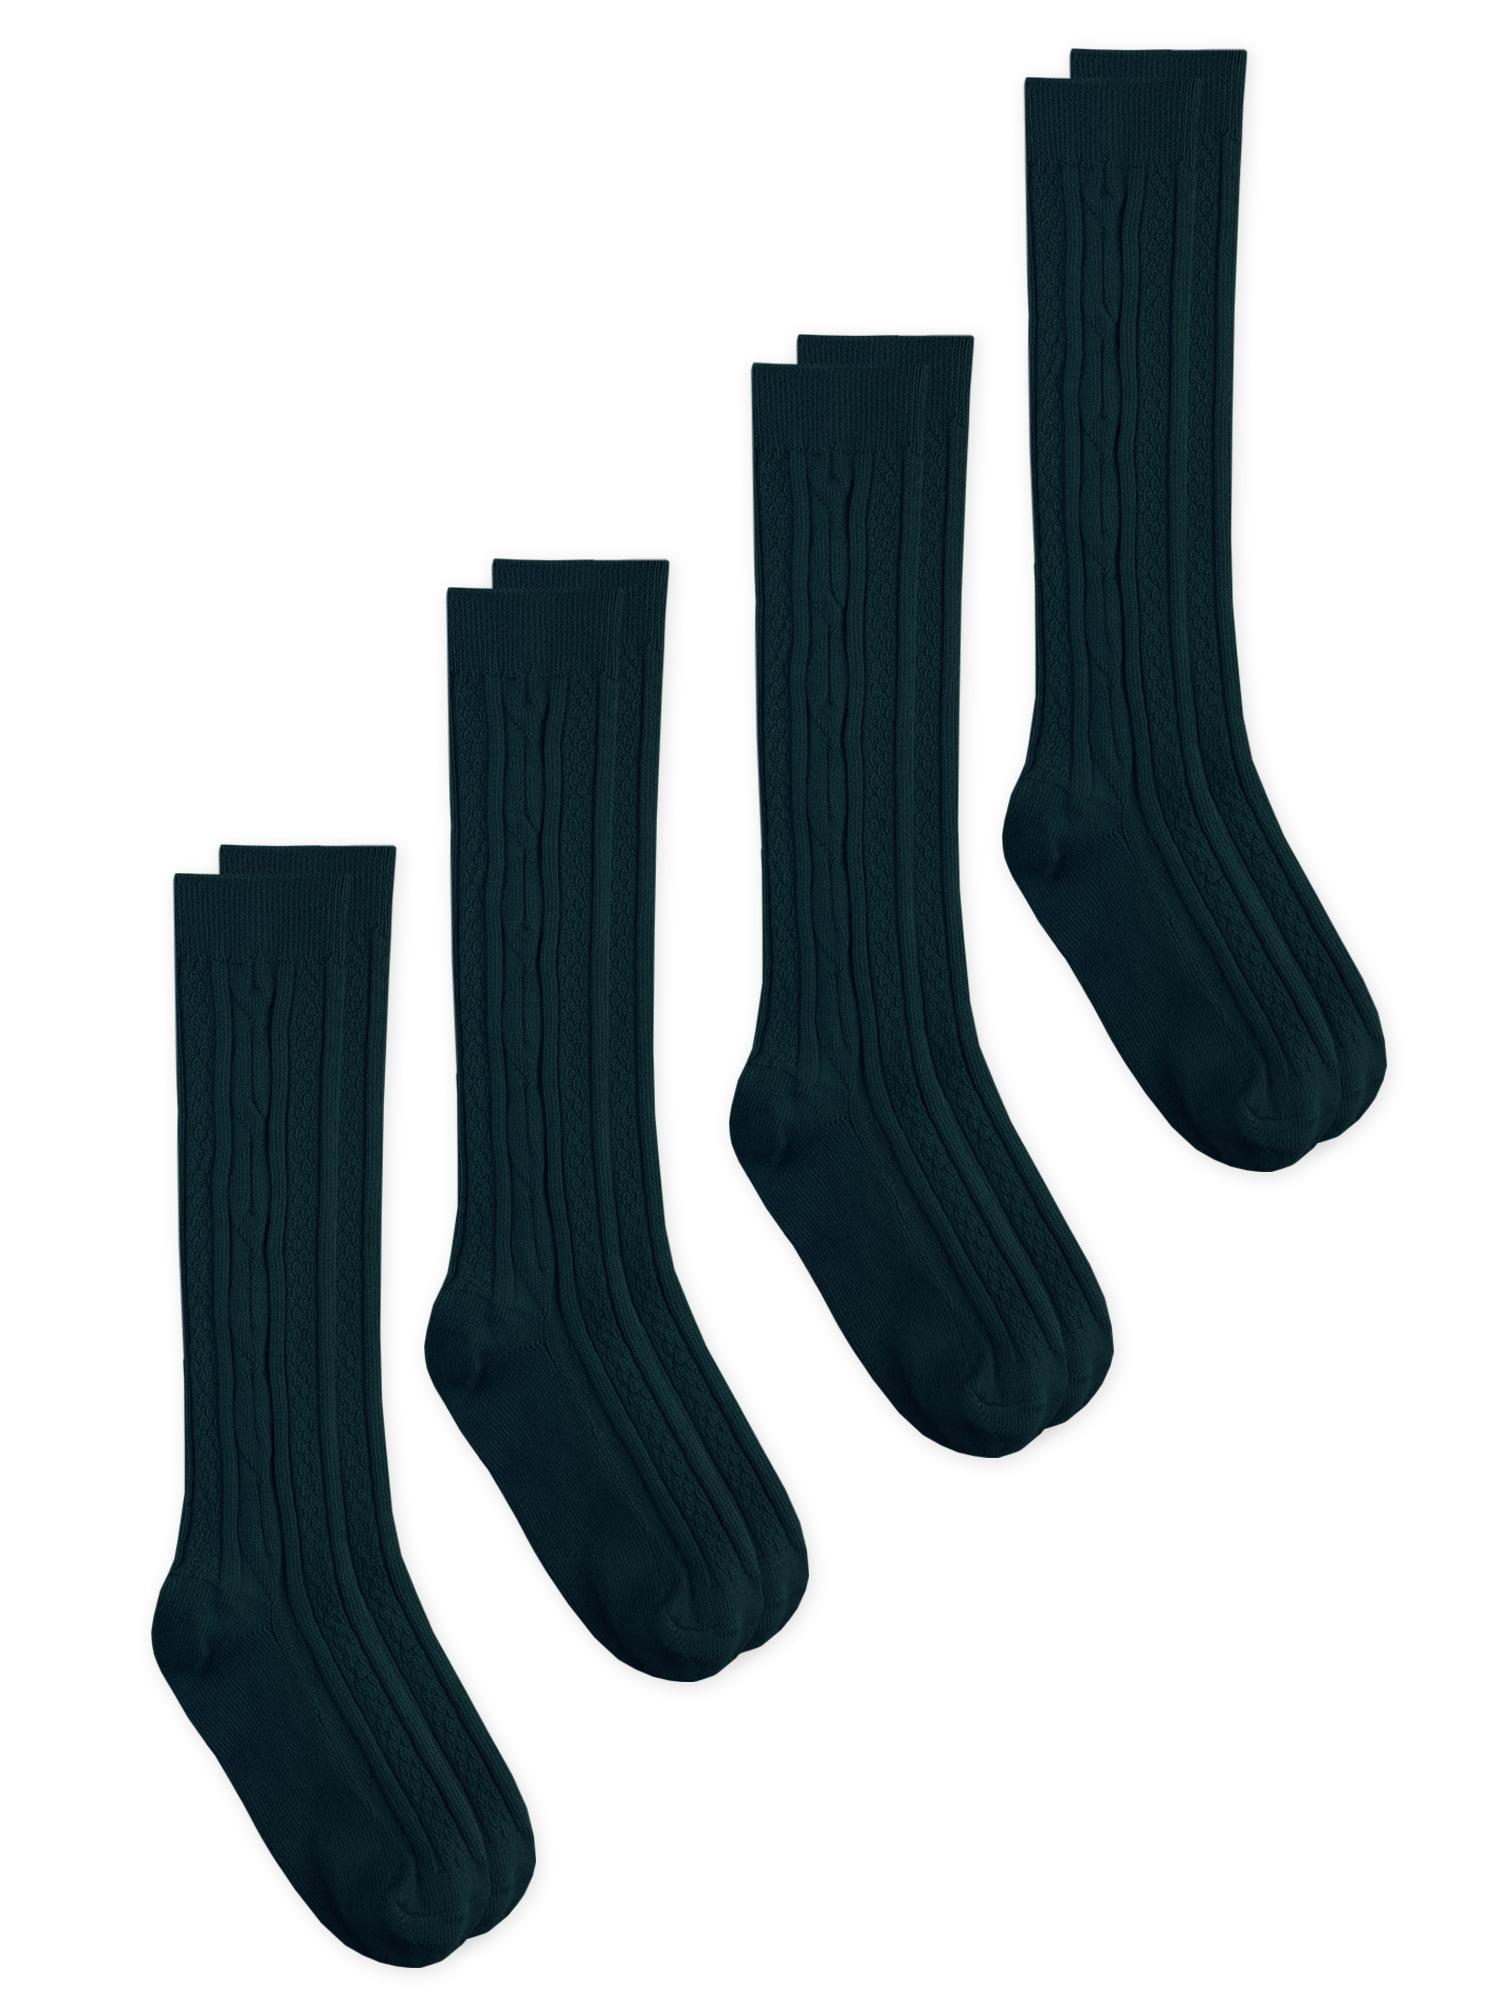 High Elasticity Girl Cotton Knee High Socks Uniform Bumblebee Pattern Women Tube Socks